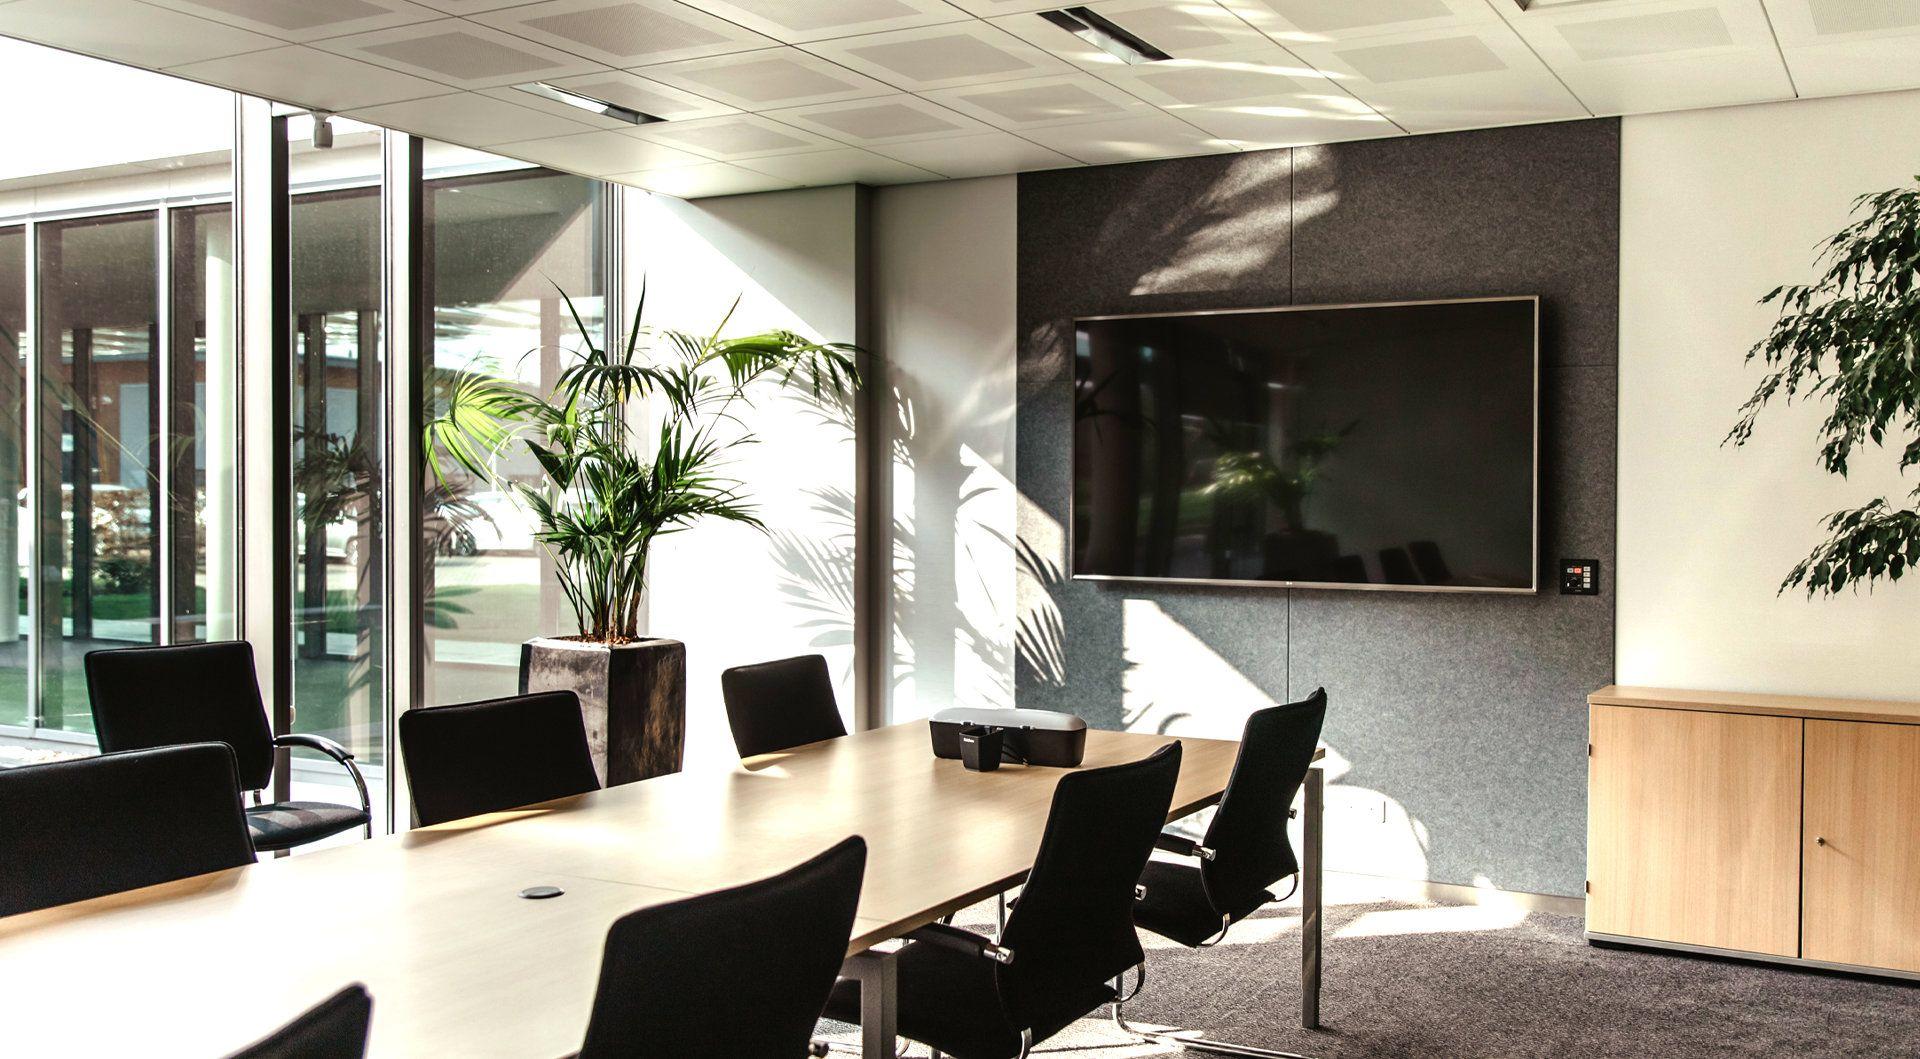 "LG 43SE3KE beeldkrant 109,2 cm (43"") LED Full HD Digitale signage flatscreen Zwart - Case studie de vries"